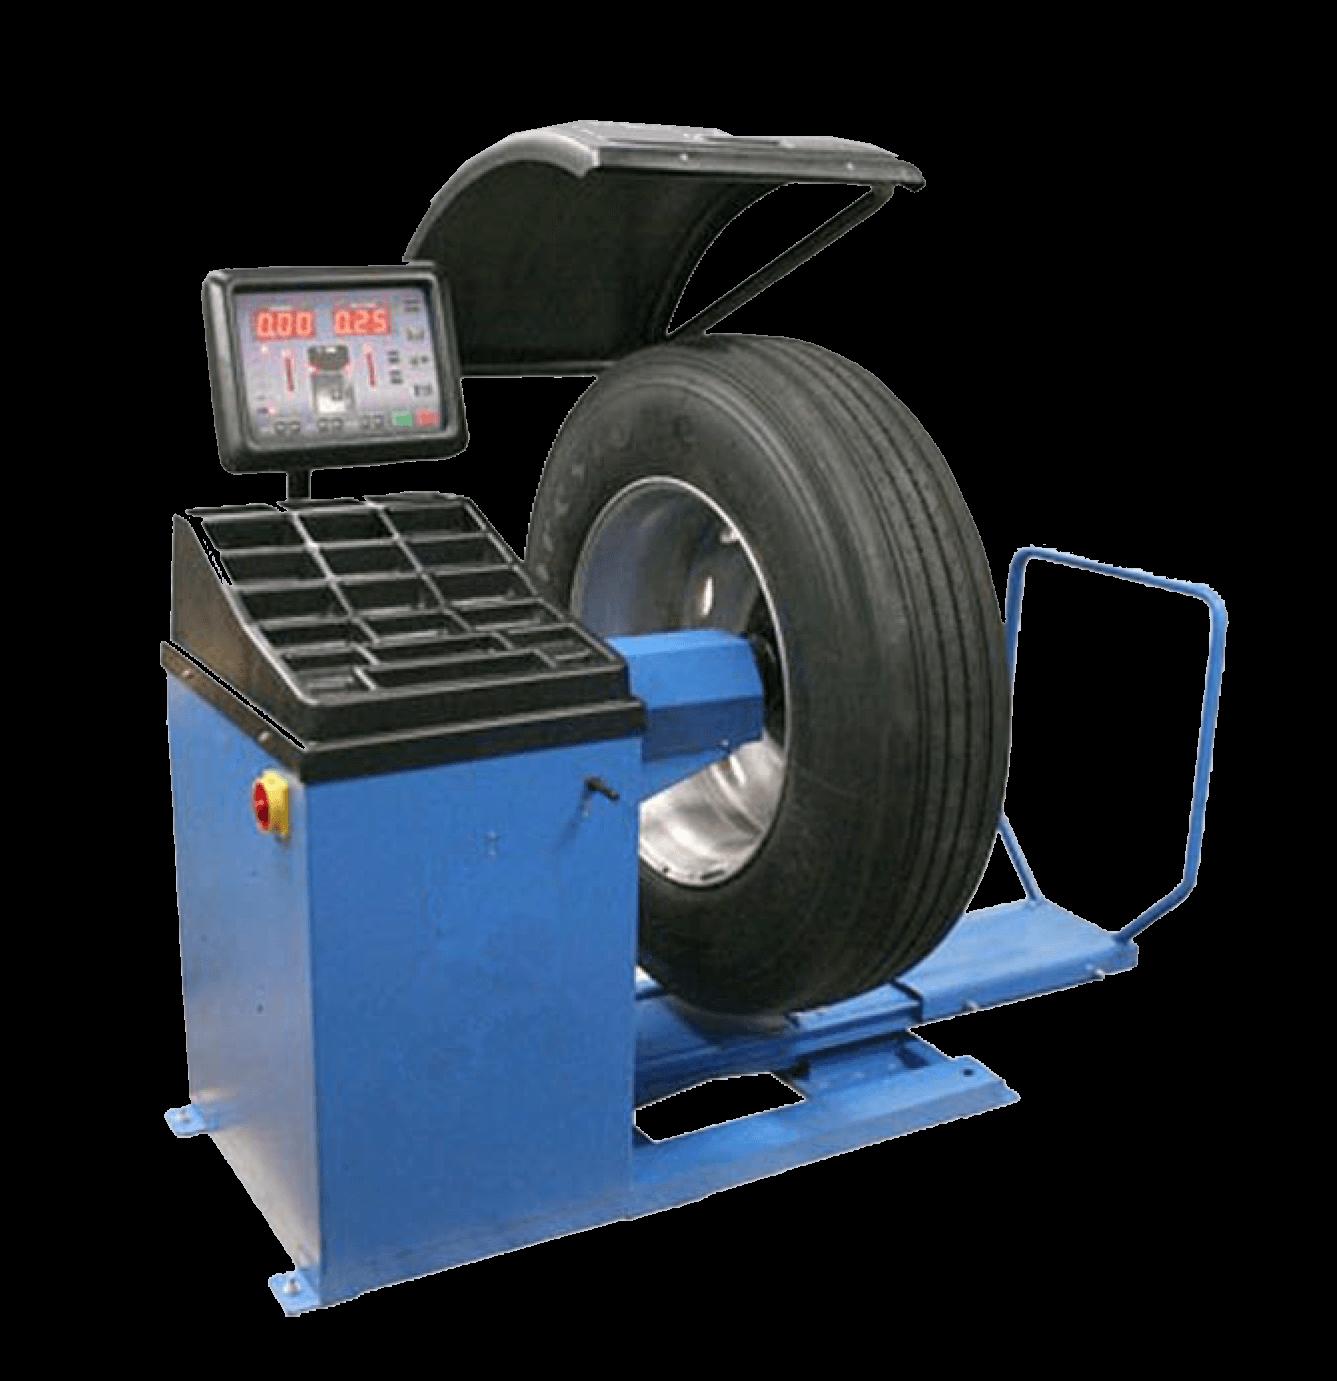 Equilibreuse de roue de poids lourds